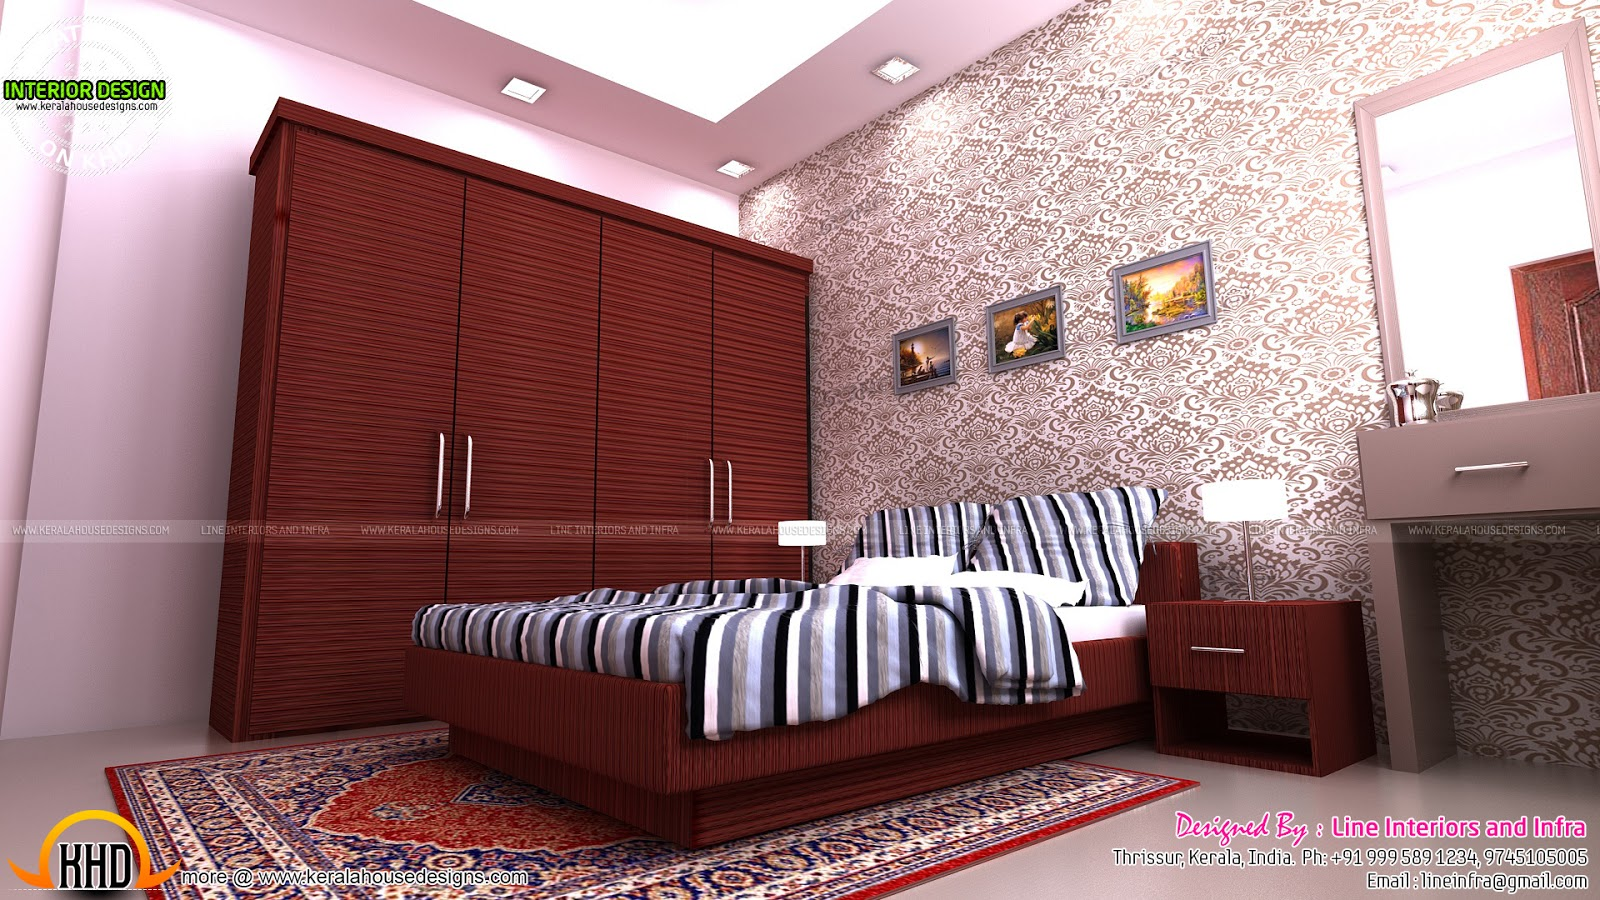 Modular kitchen bedroom dining interiors in kerala for Dining room wardrobe designs